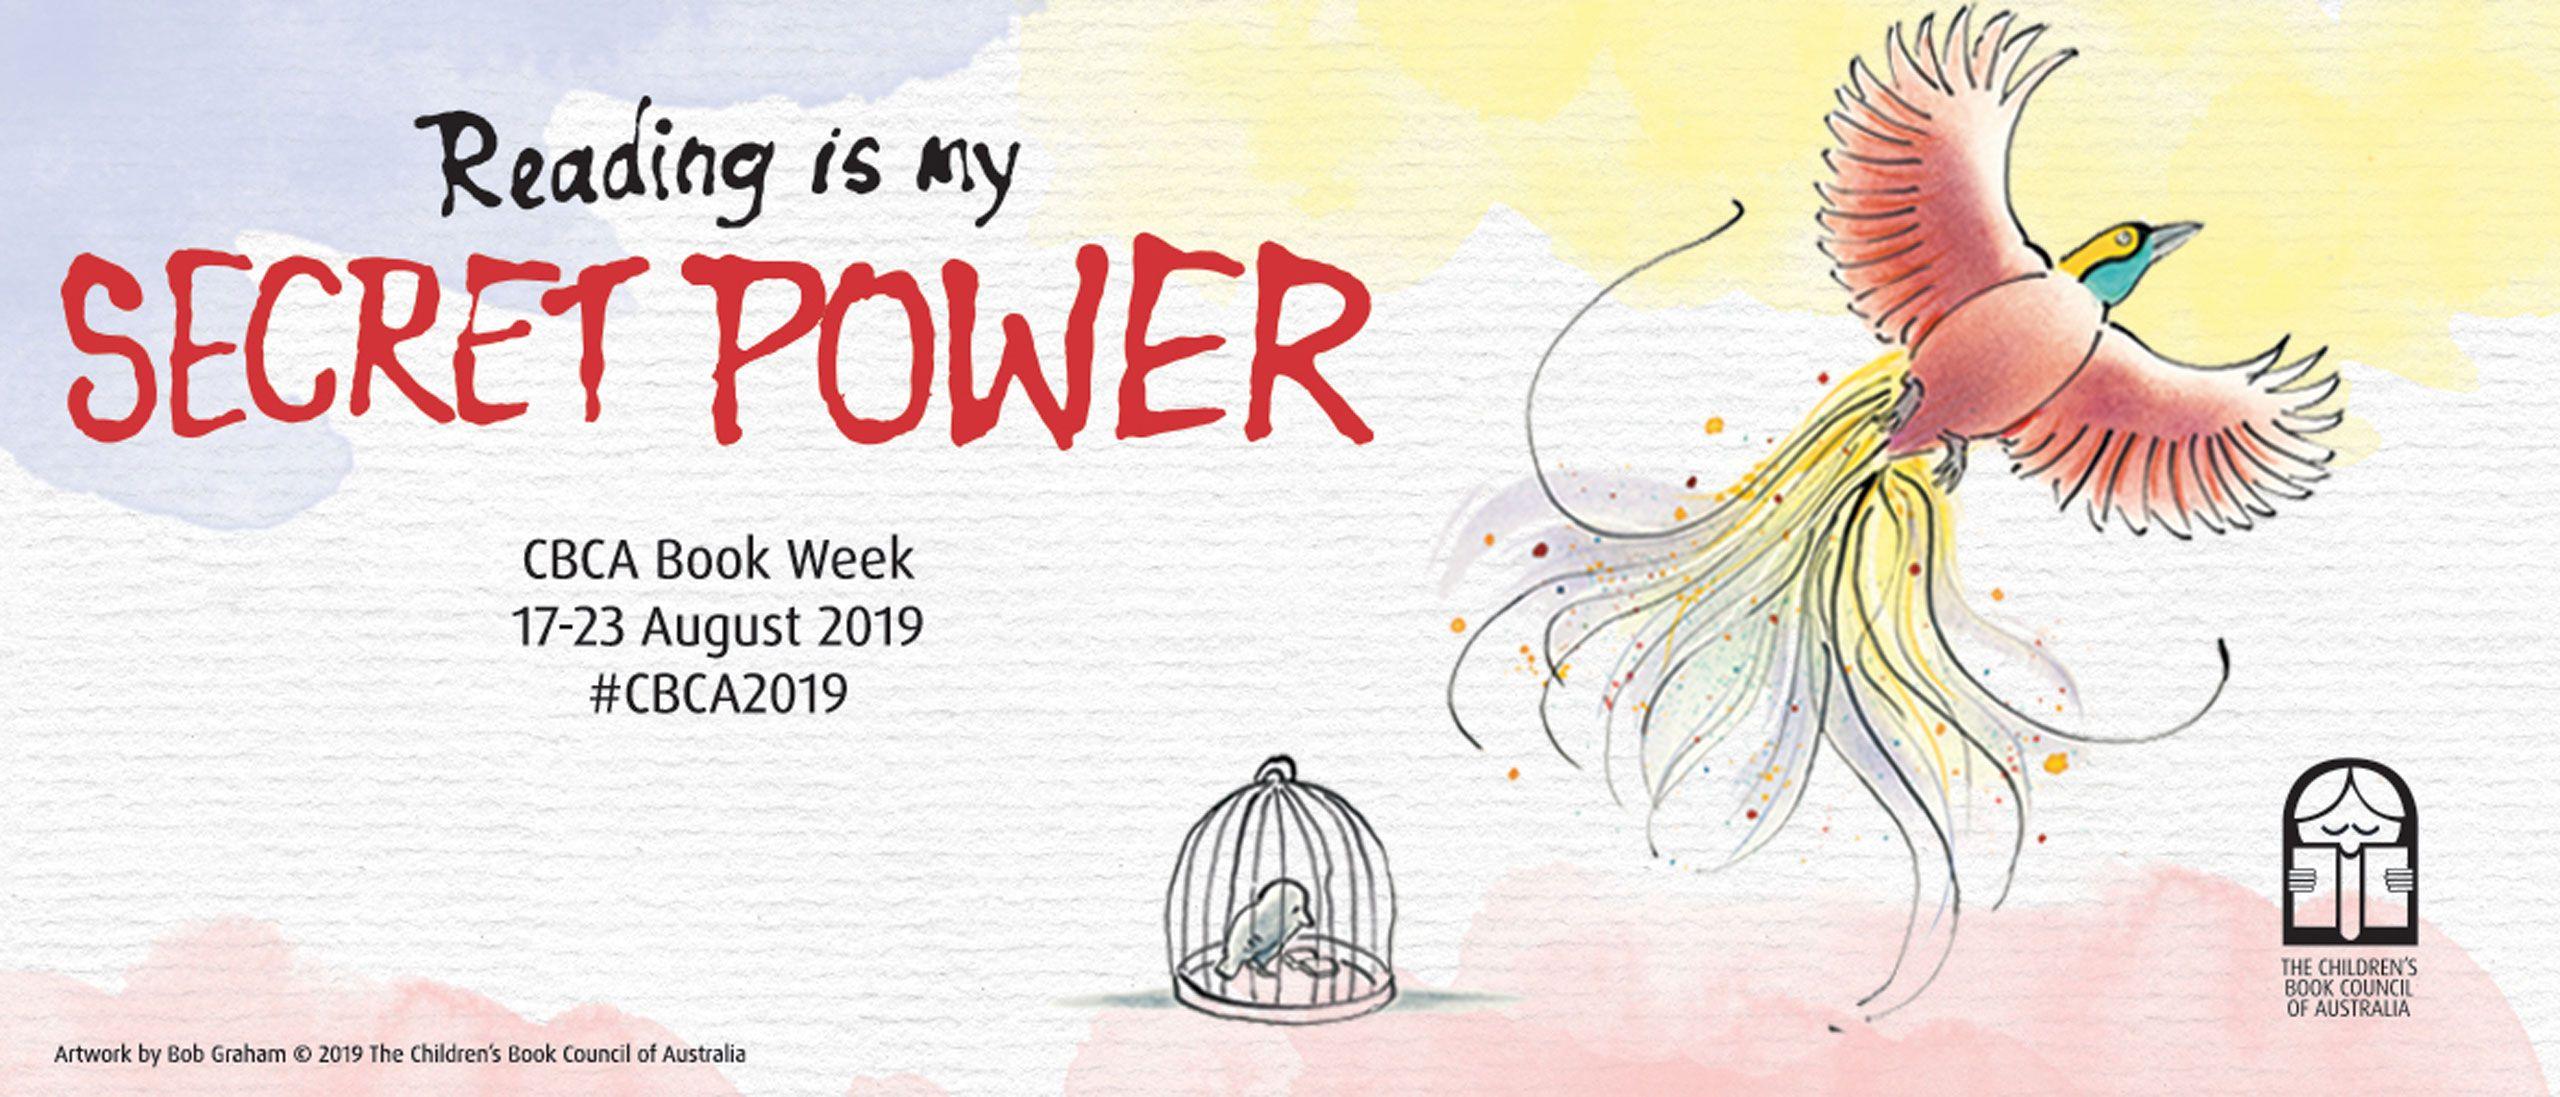 Book-Week-banner